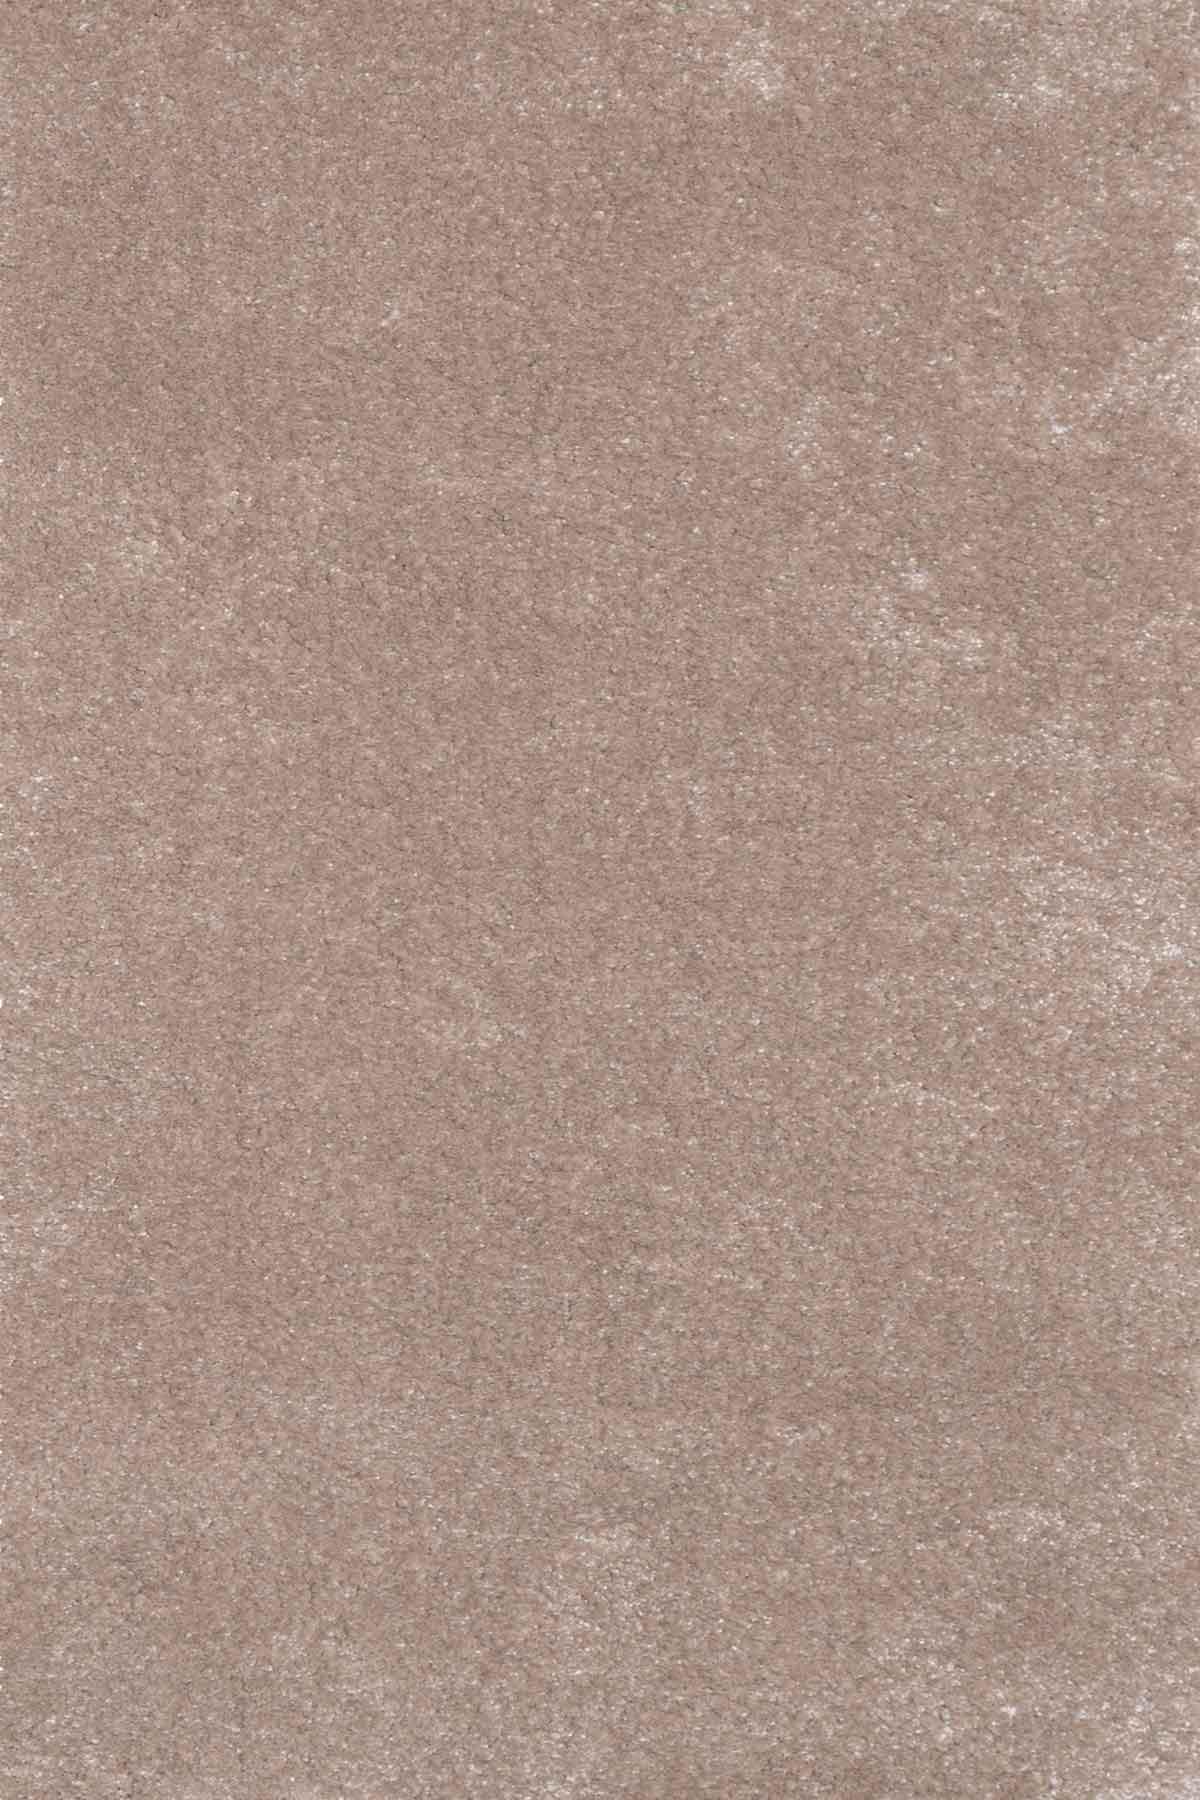 Sintelon koberce Kusový koberec Toscana 01/OOO - 80x150 cm